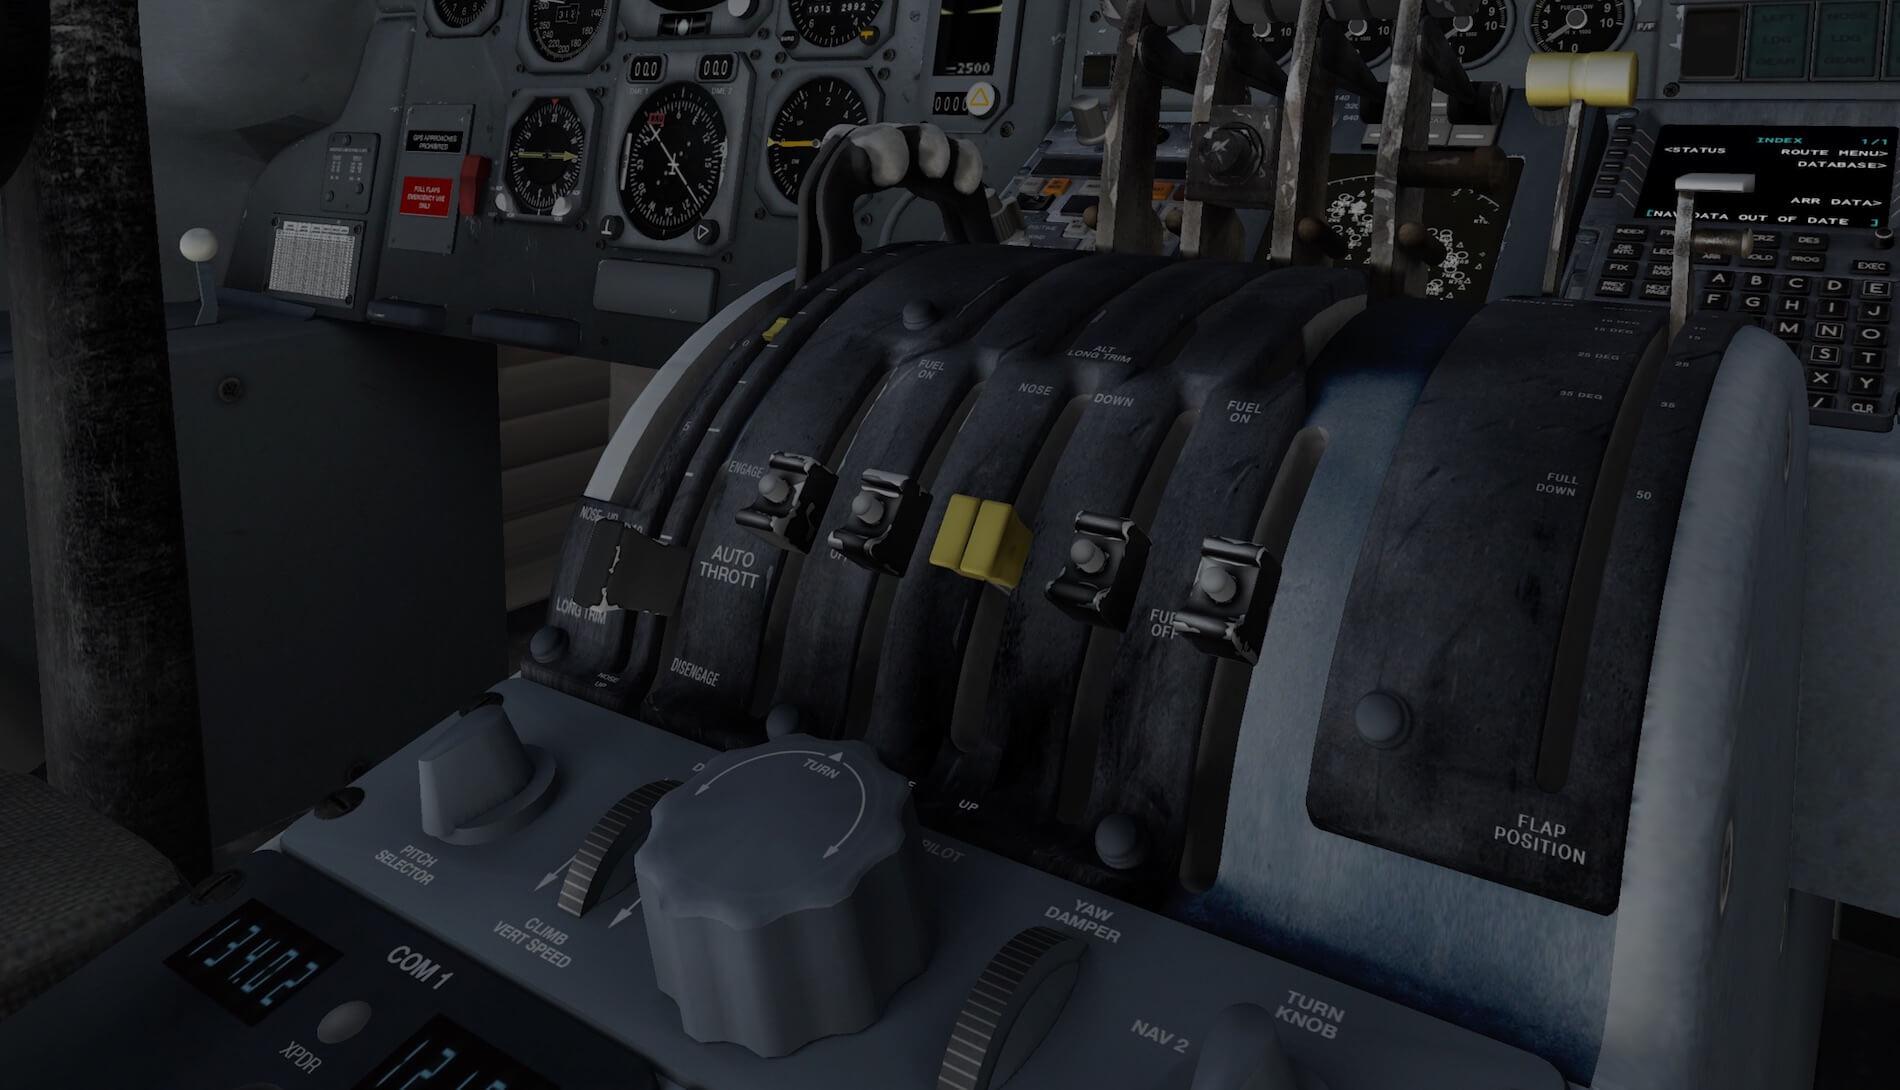 DC-8-61_18